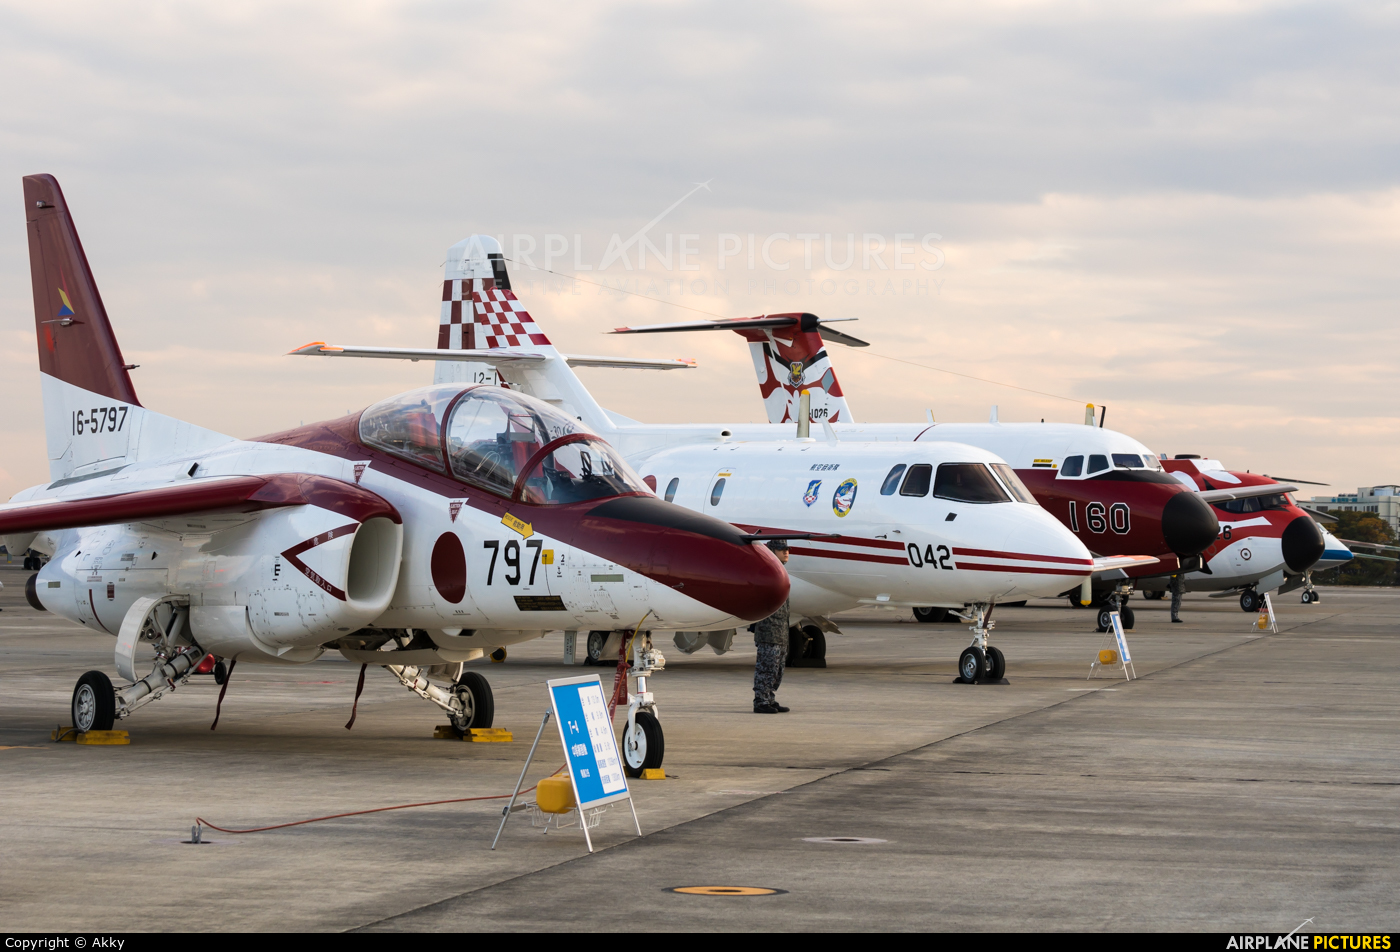 Japan - Air Self Defence Force 16-5797 aircraft at Iruma AB